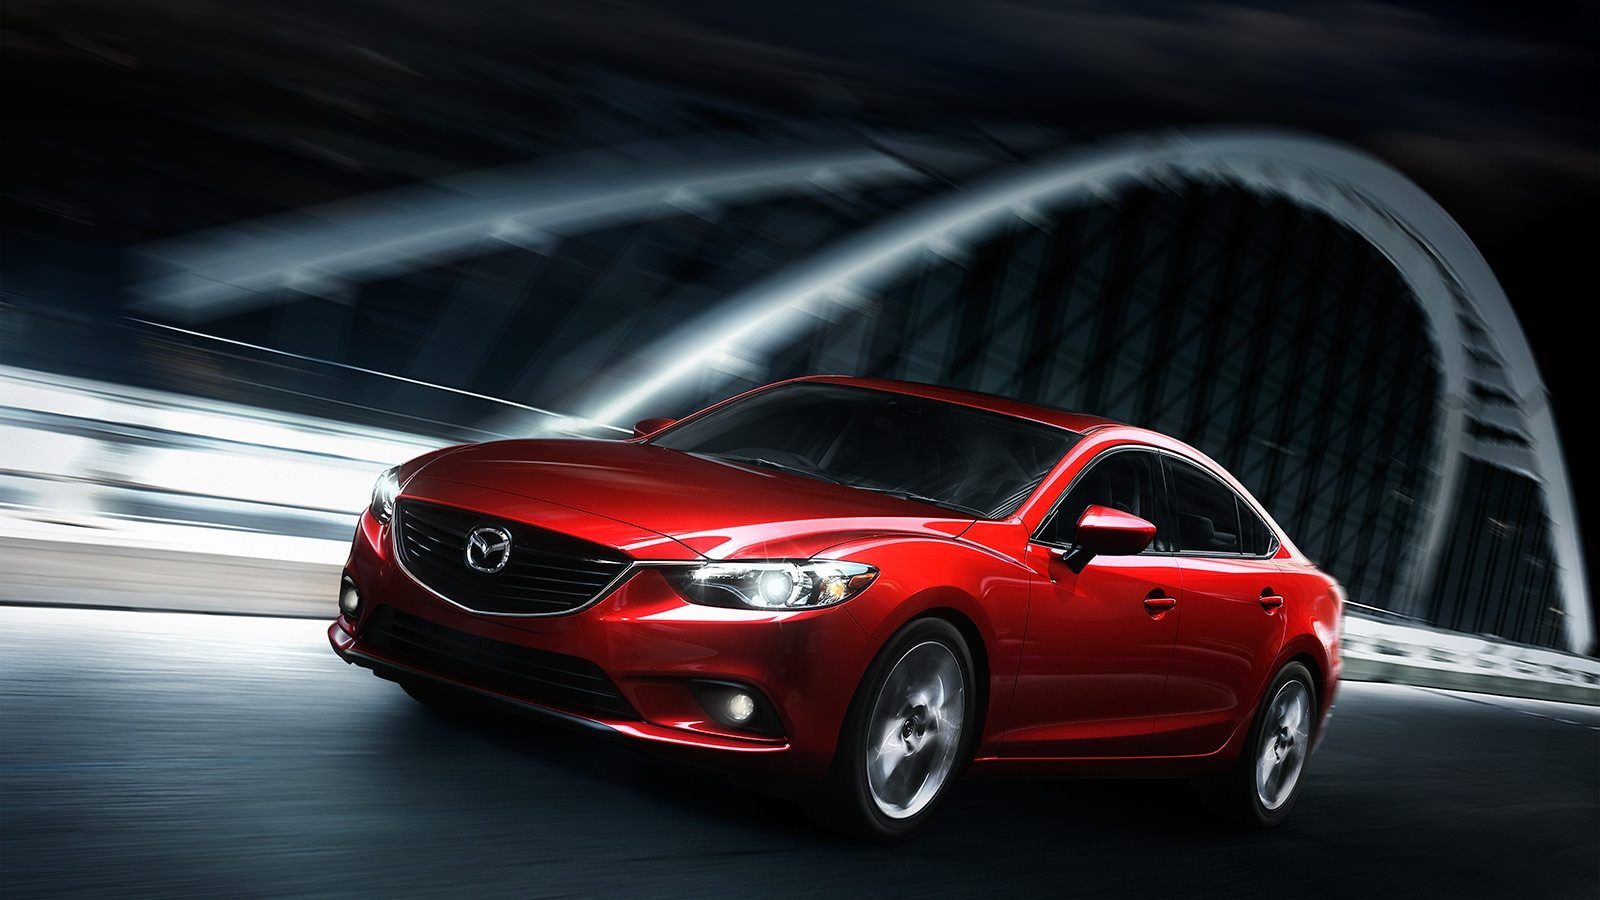 2015 Mazda6 Exterior Front